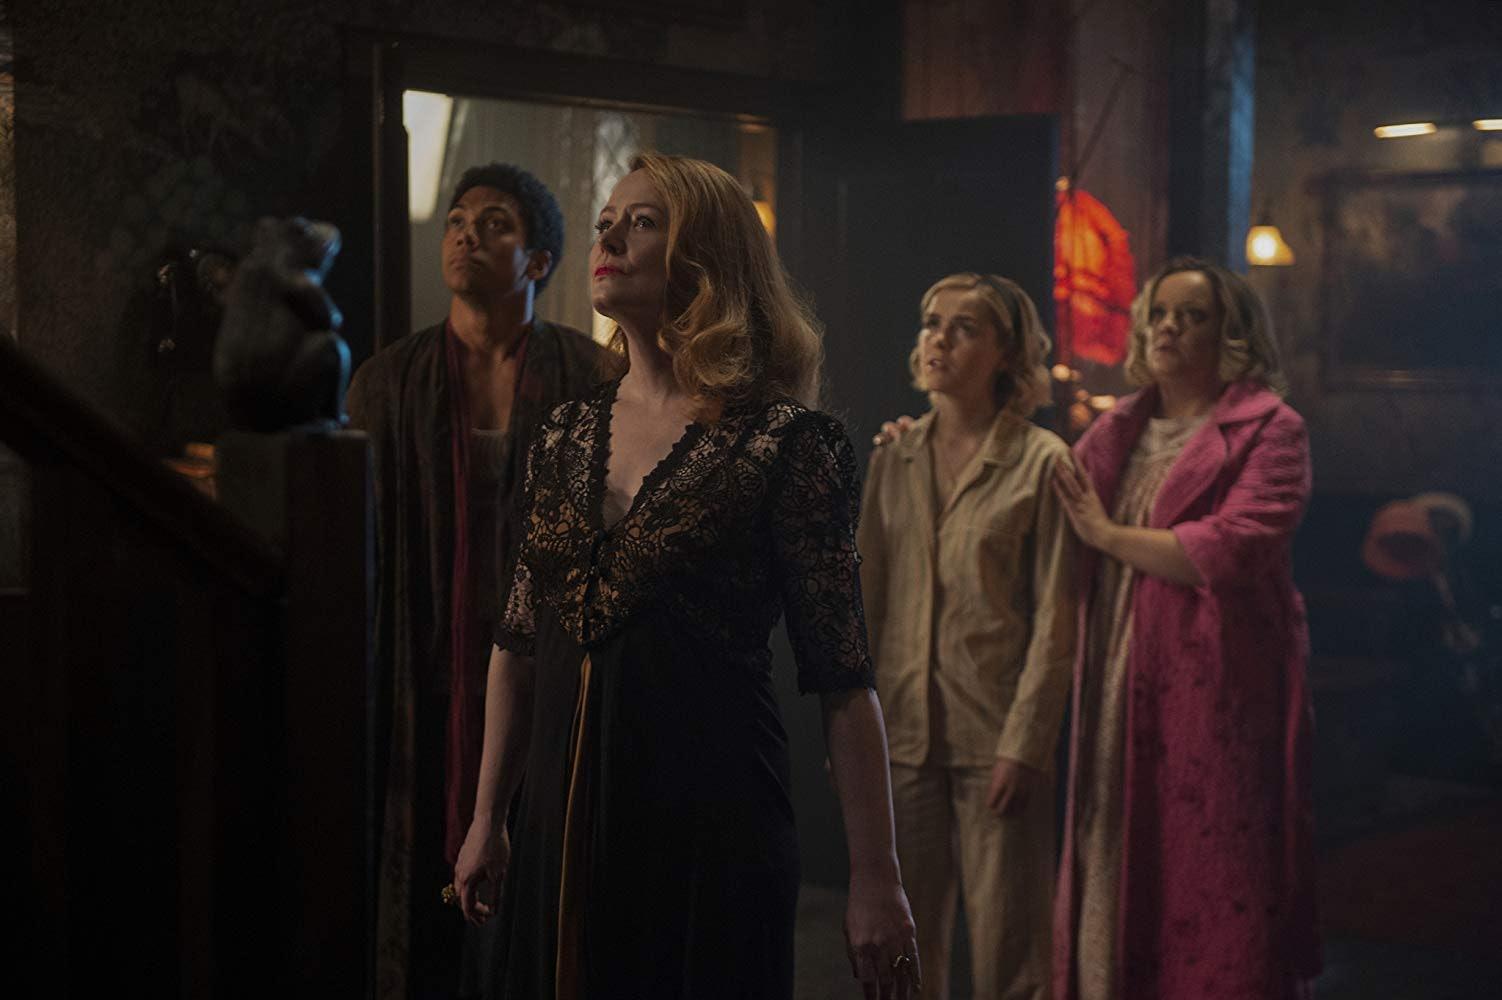 Miranda Otto, Chance Perdomo, Kiernan Shipka, and Lucy Davis in Netflix's 'Chilling Adventures of Sabrina'